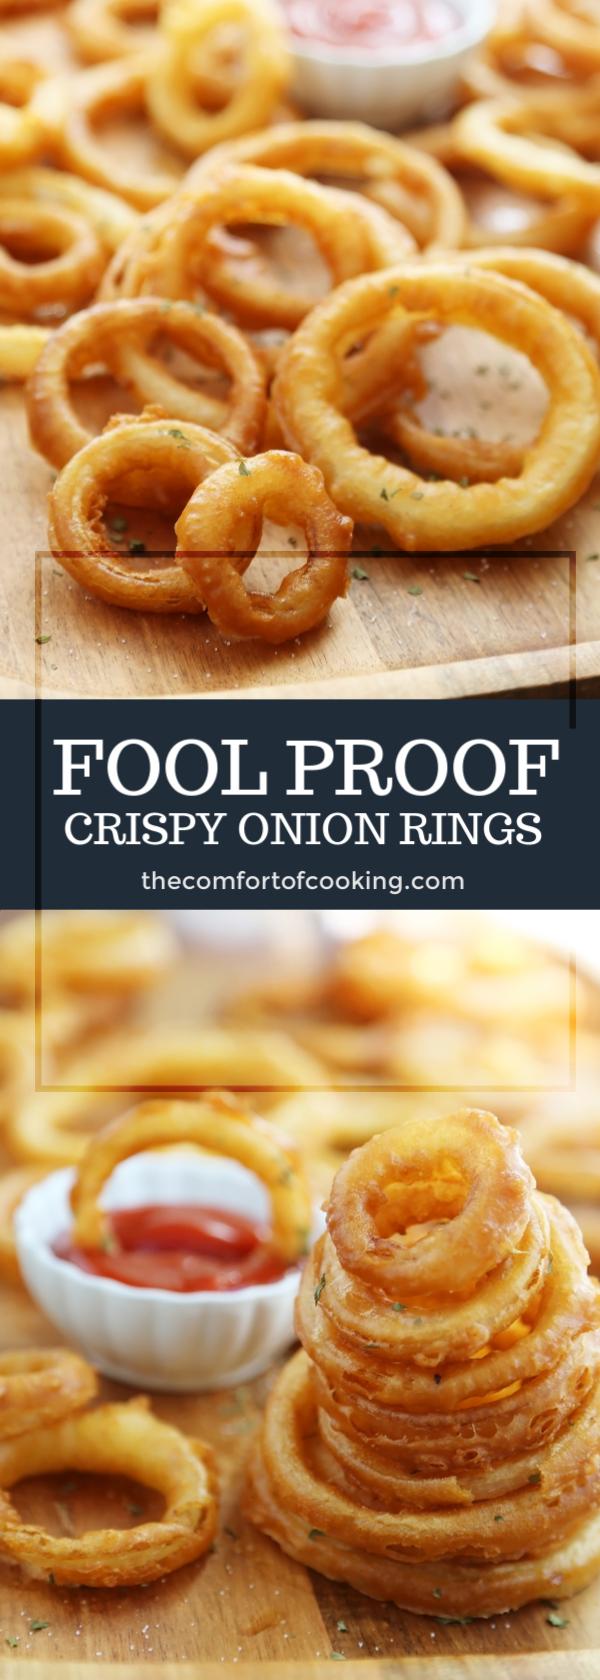 Foolproof Crispy Onion Rings